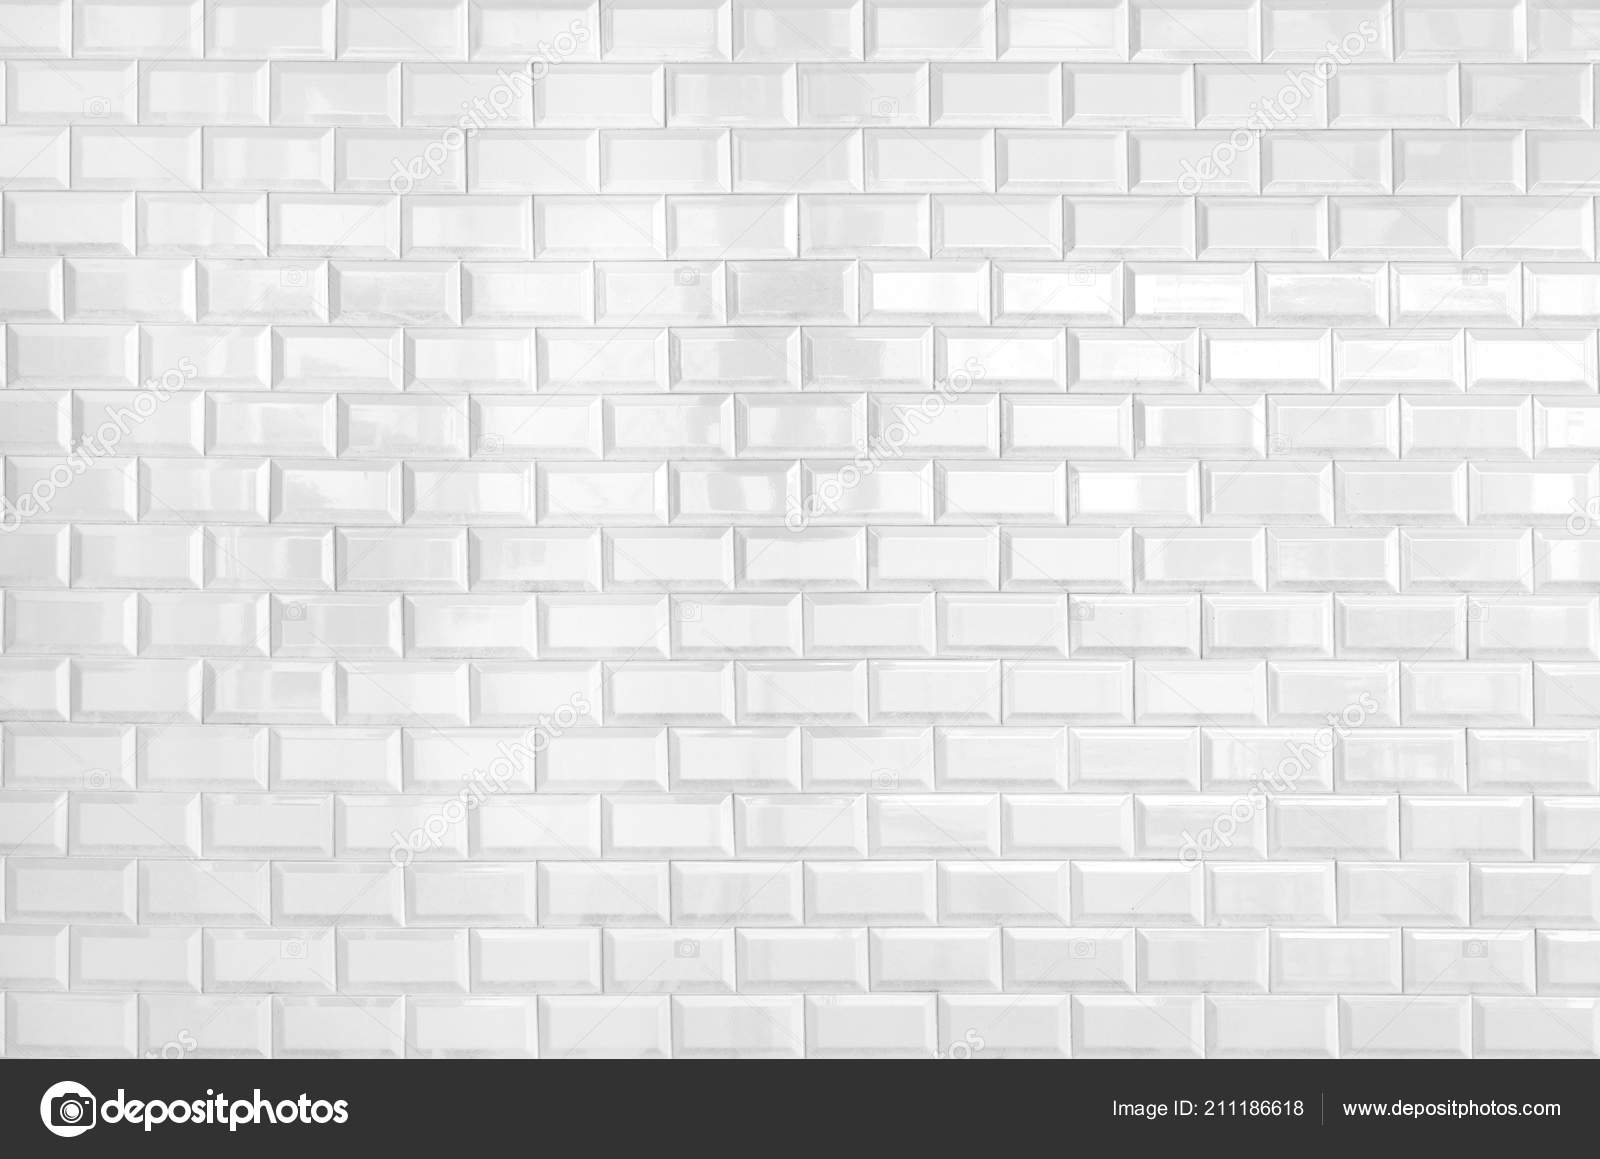 Brick Wallpaper Decor White Brick Wall Texture Background